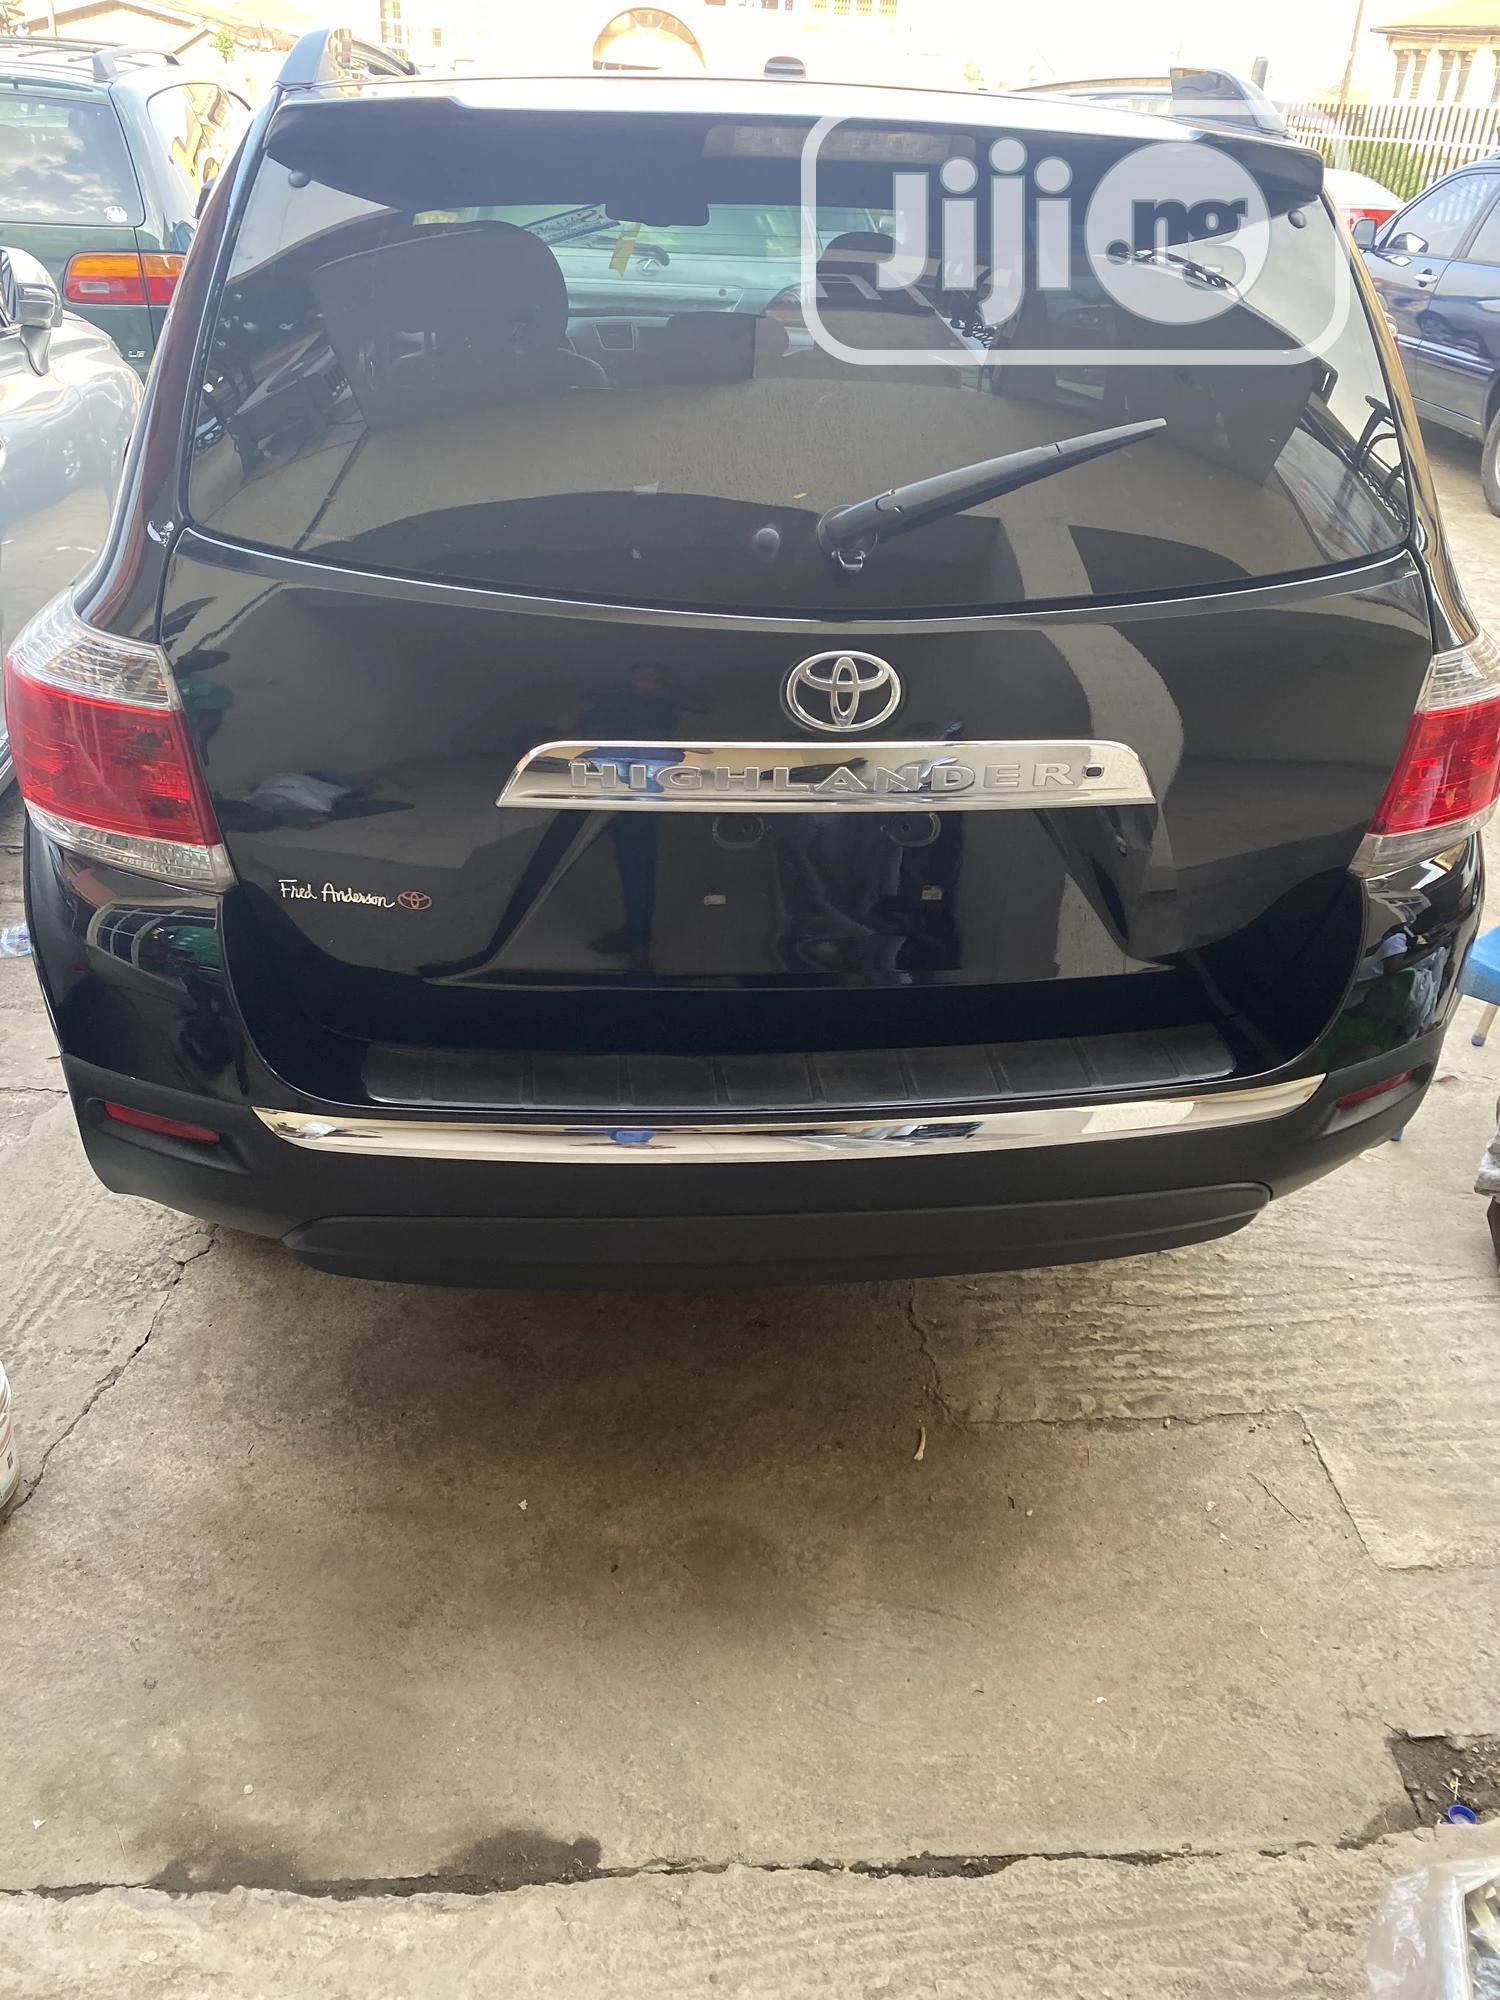 Toyota Highlander 2013 Limited 3.5l 4WD Black | Cars for sale in Ibadan, Oyo State, Nigeria